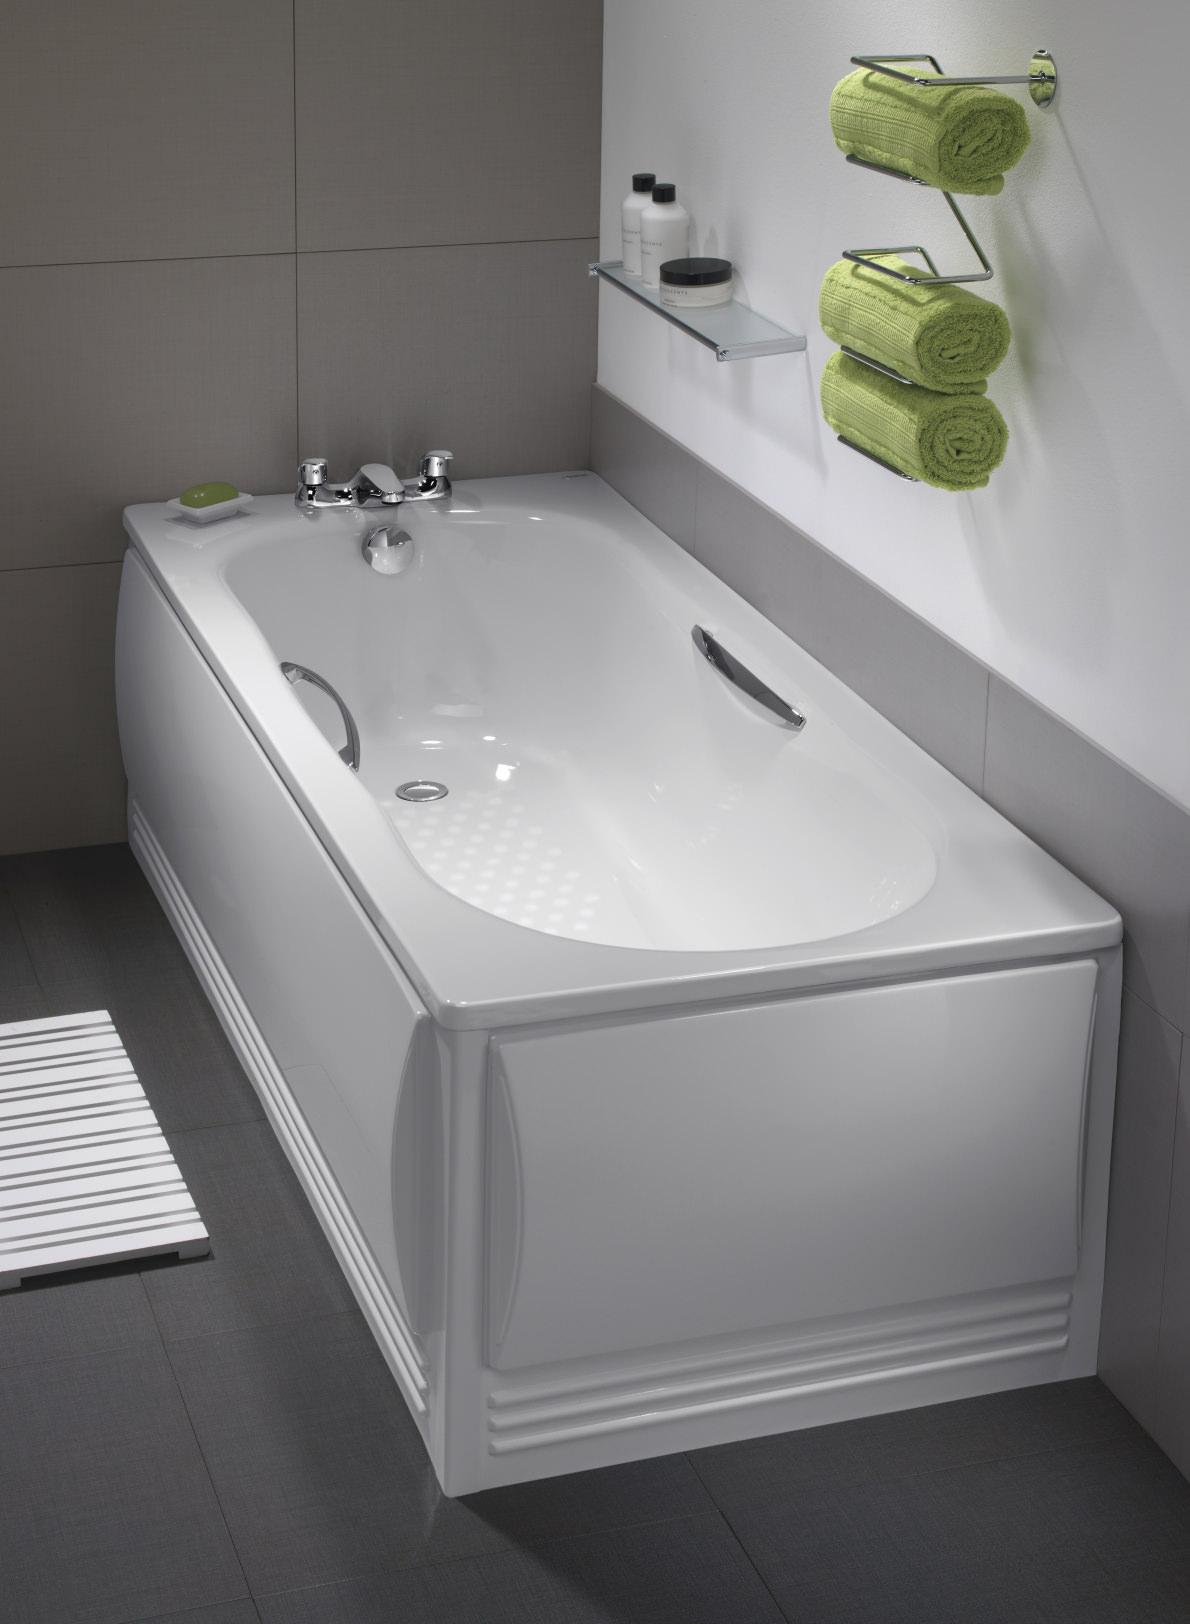 Twyford Celtic Plain Steel Bath 1600 x 700mm With Legs And Grips